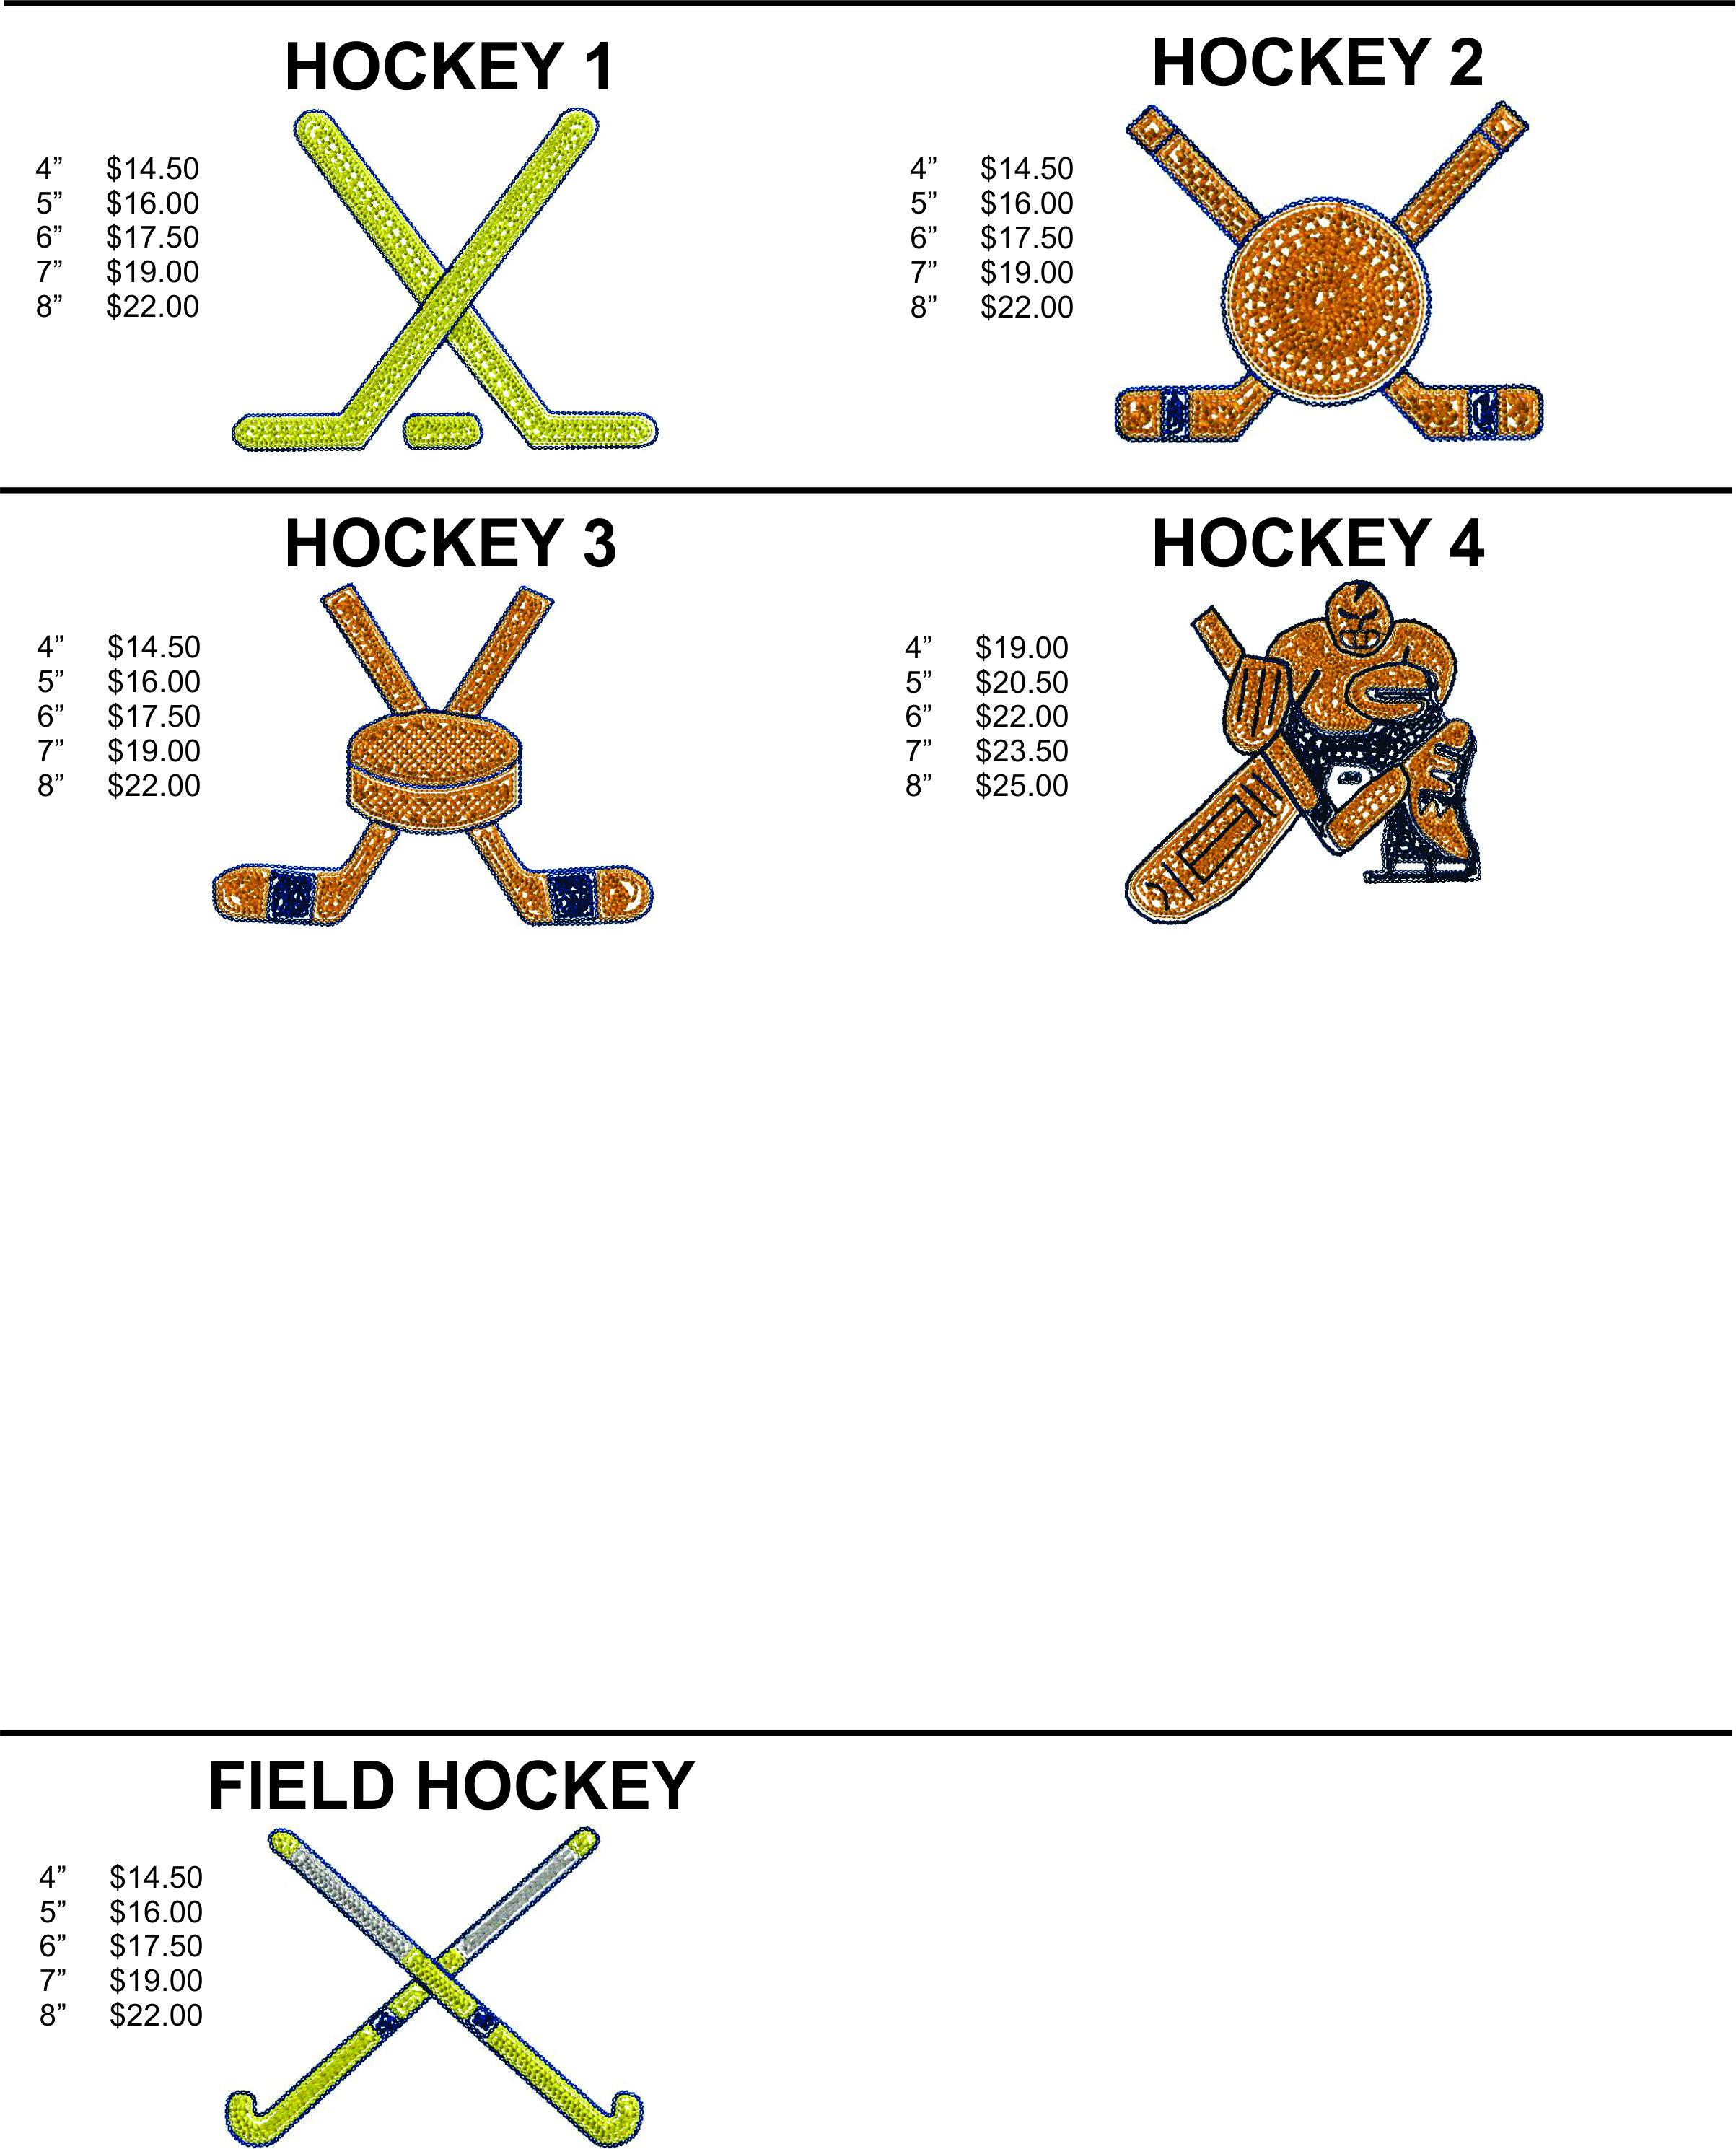 hockey-field-hockey.jpg